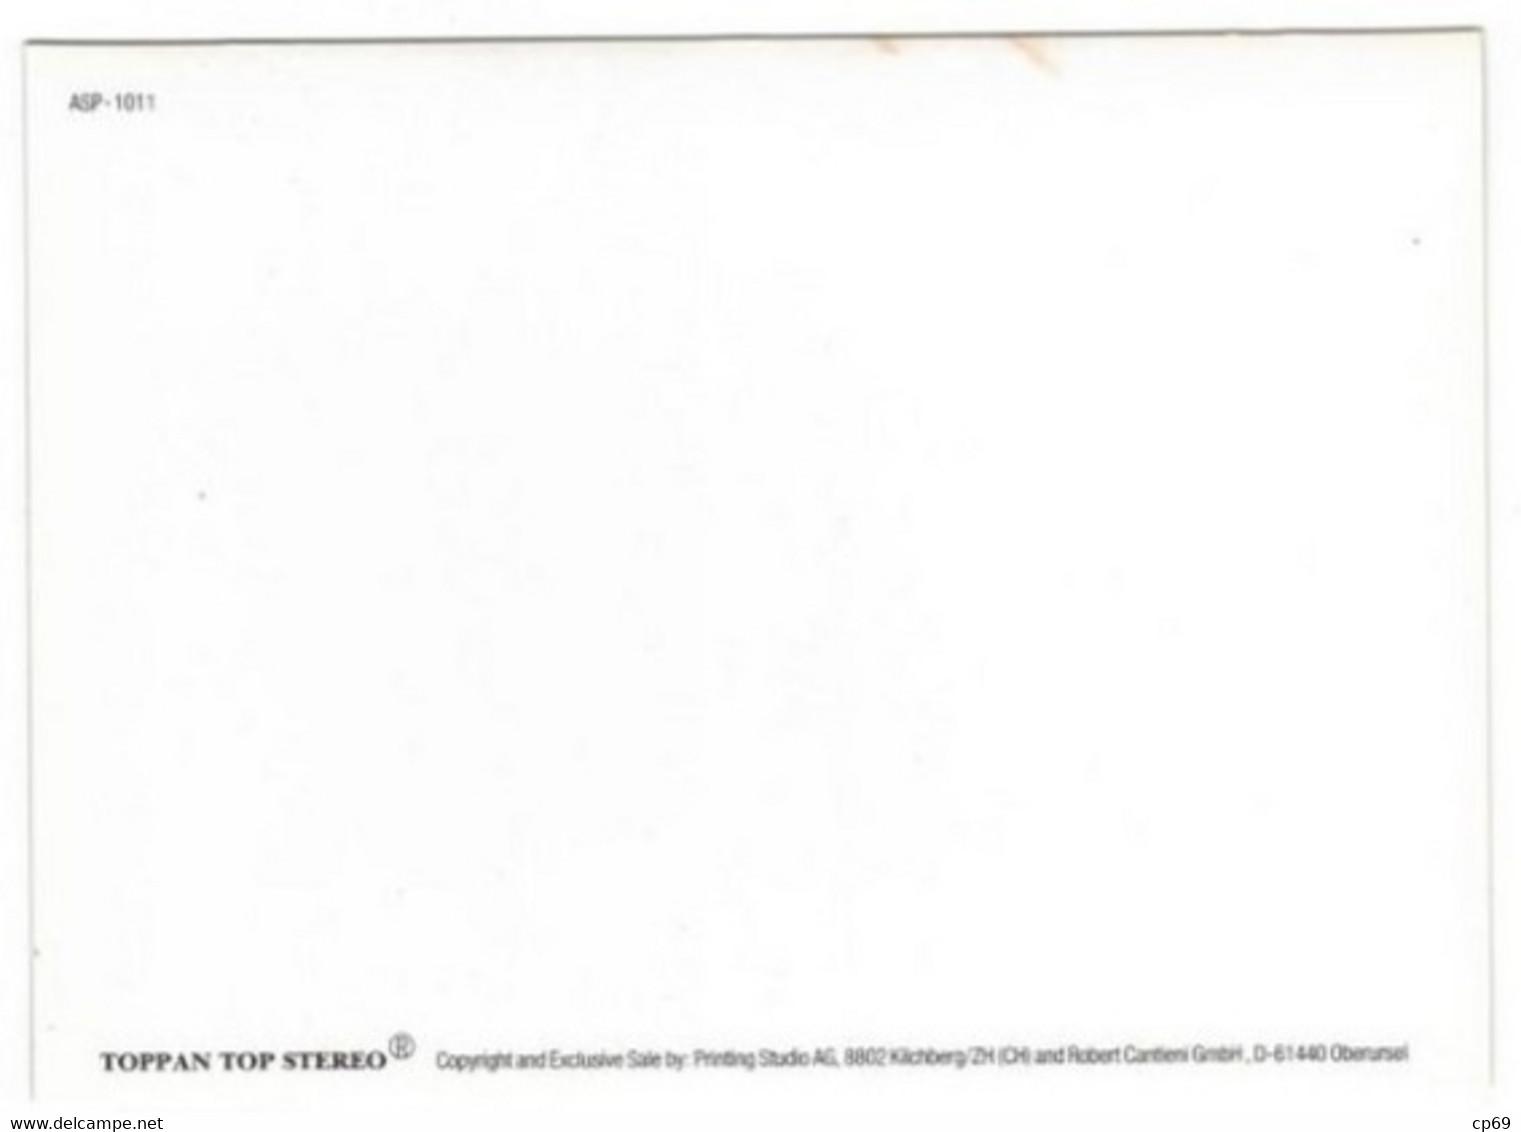 Carte En Relief 3D Lenticulaire Lenticular Génie Genius 10,5 Cm X 14,6 Cm ASP-1011 TB.Etat - Altri